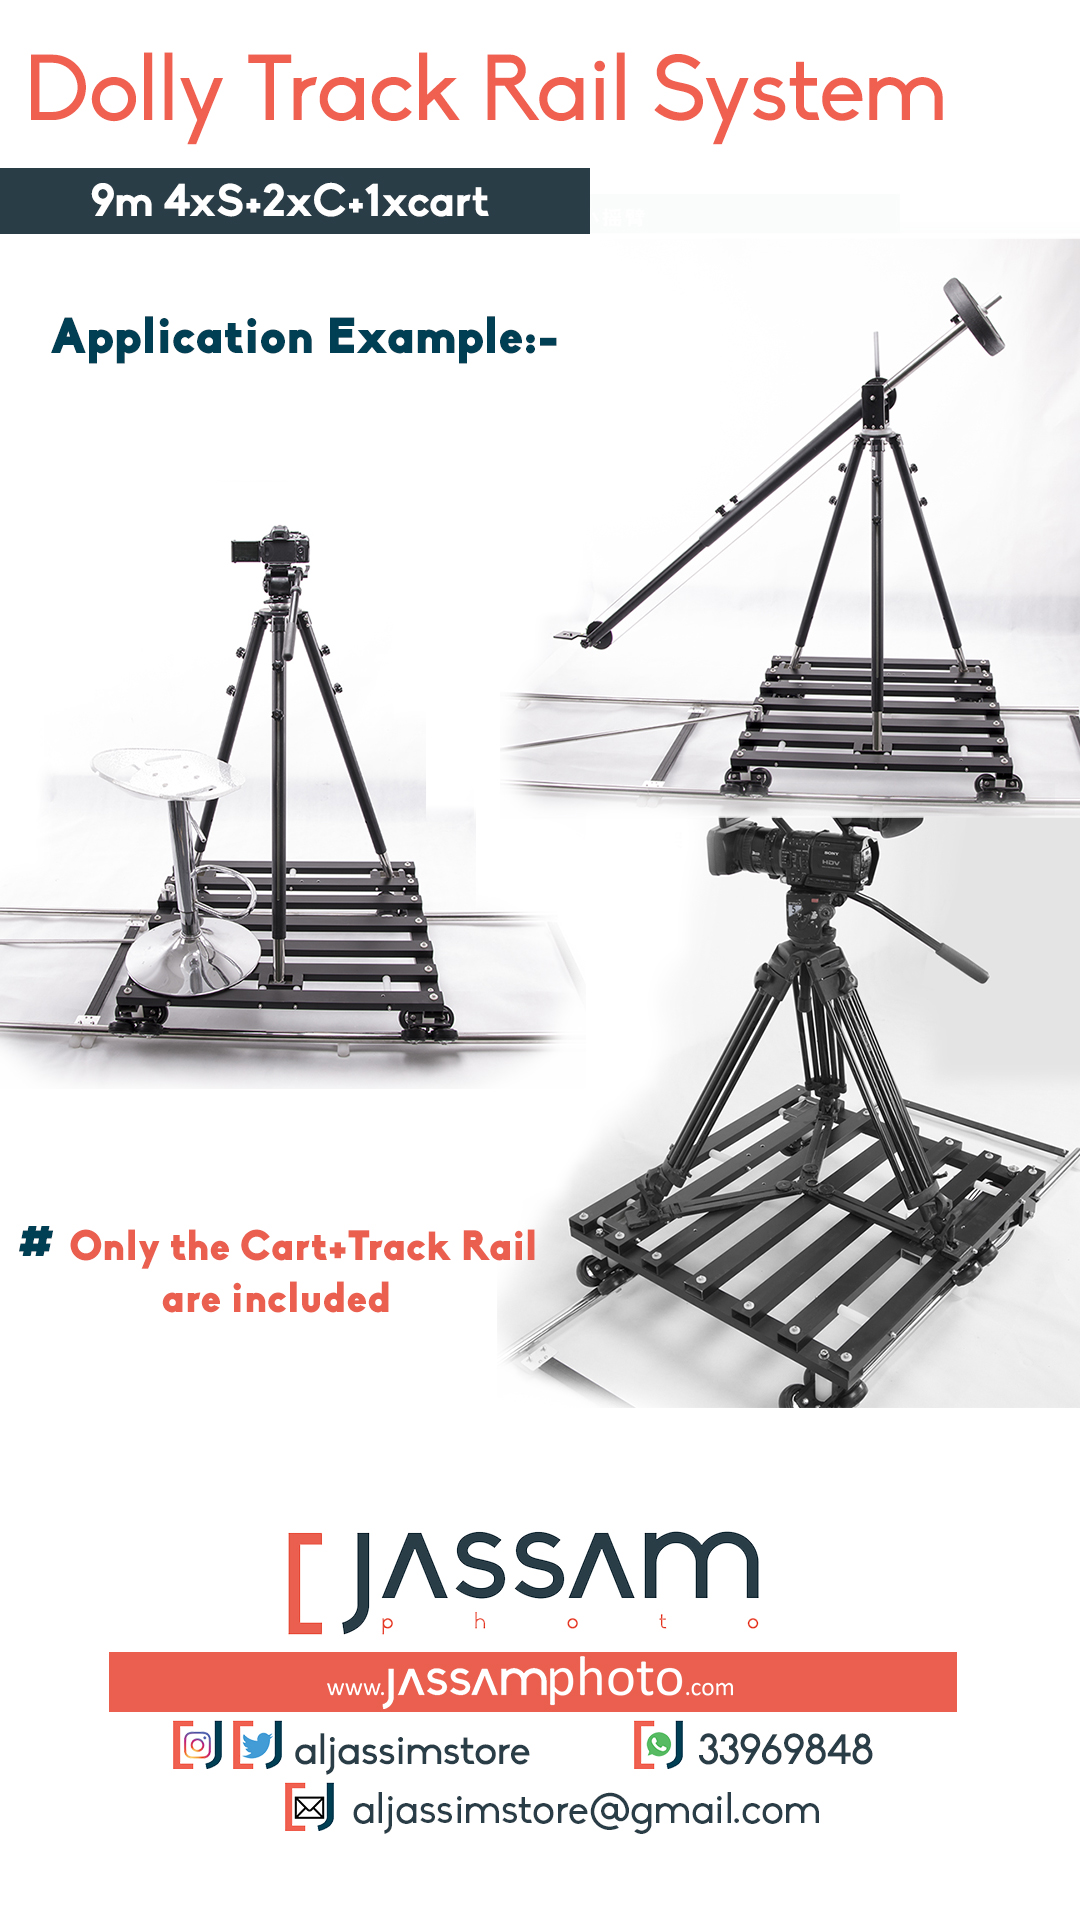 Dolly Track Rail